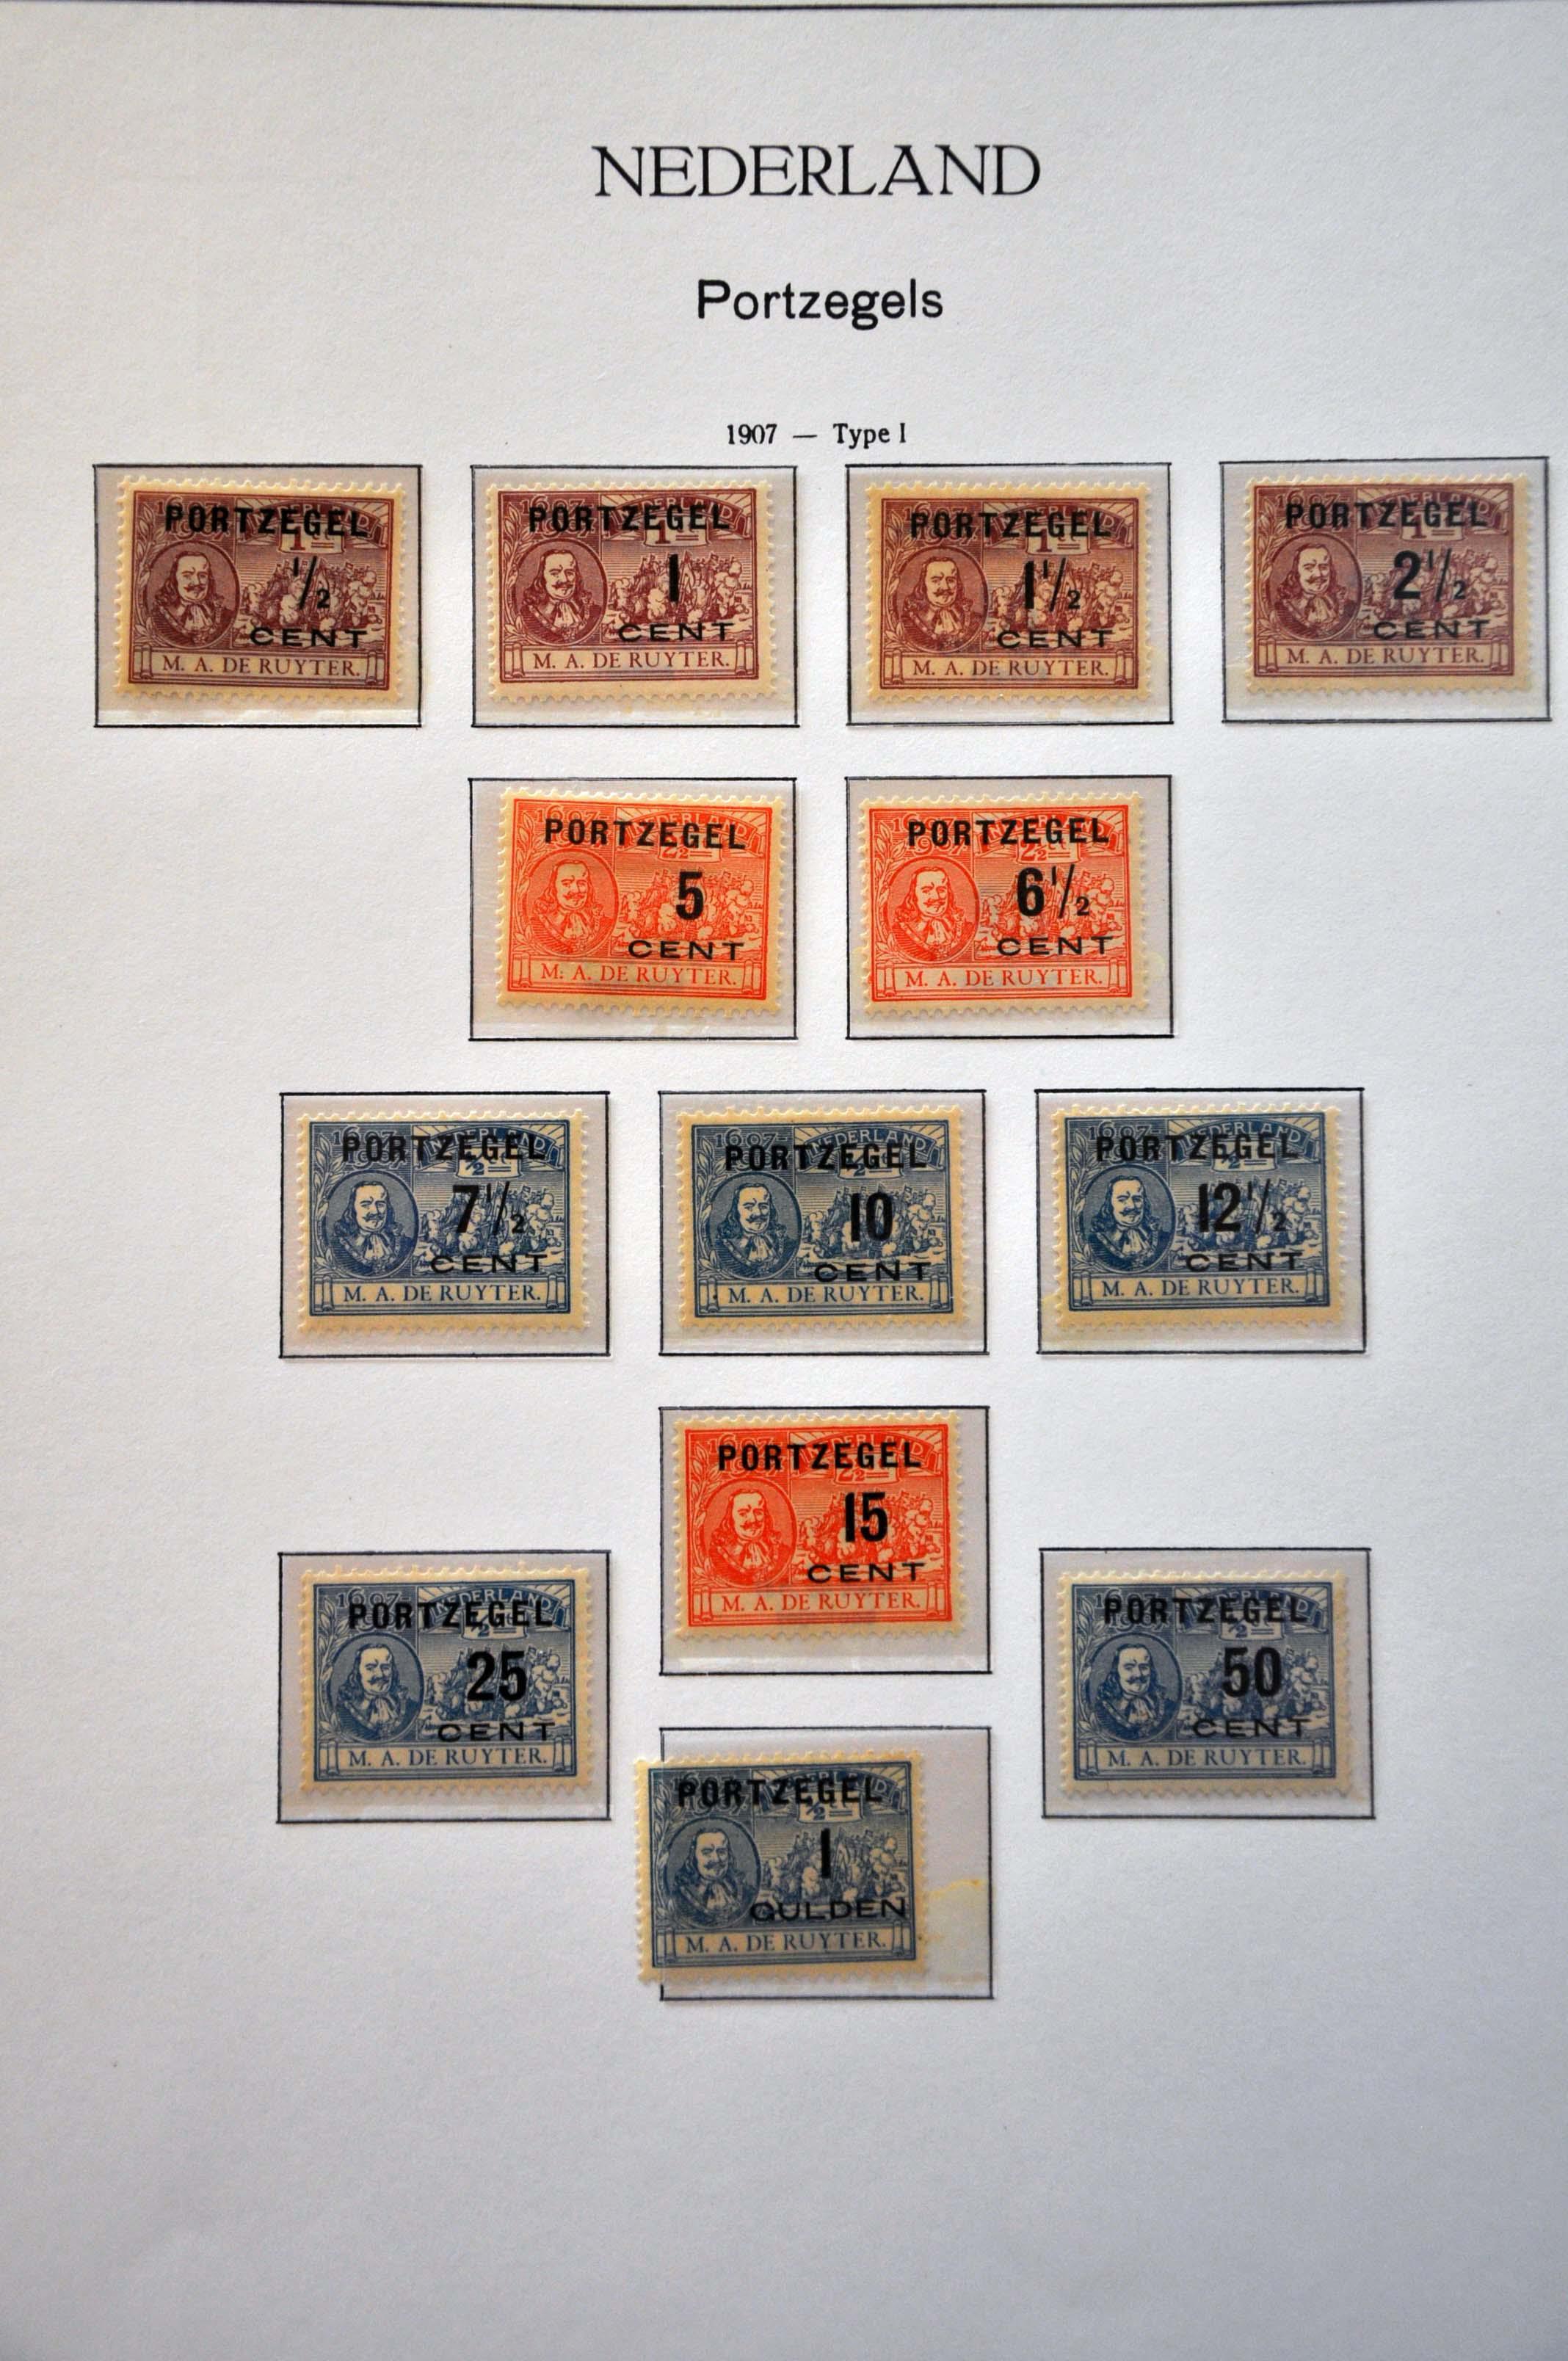 Lot 1725 - Netherlands and former colonies Netherlands -  Corinphila Veilingen Auction 242: General sale